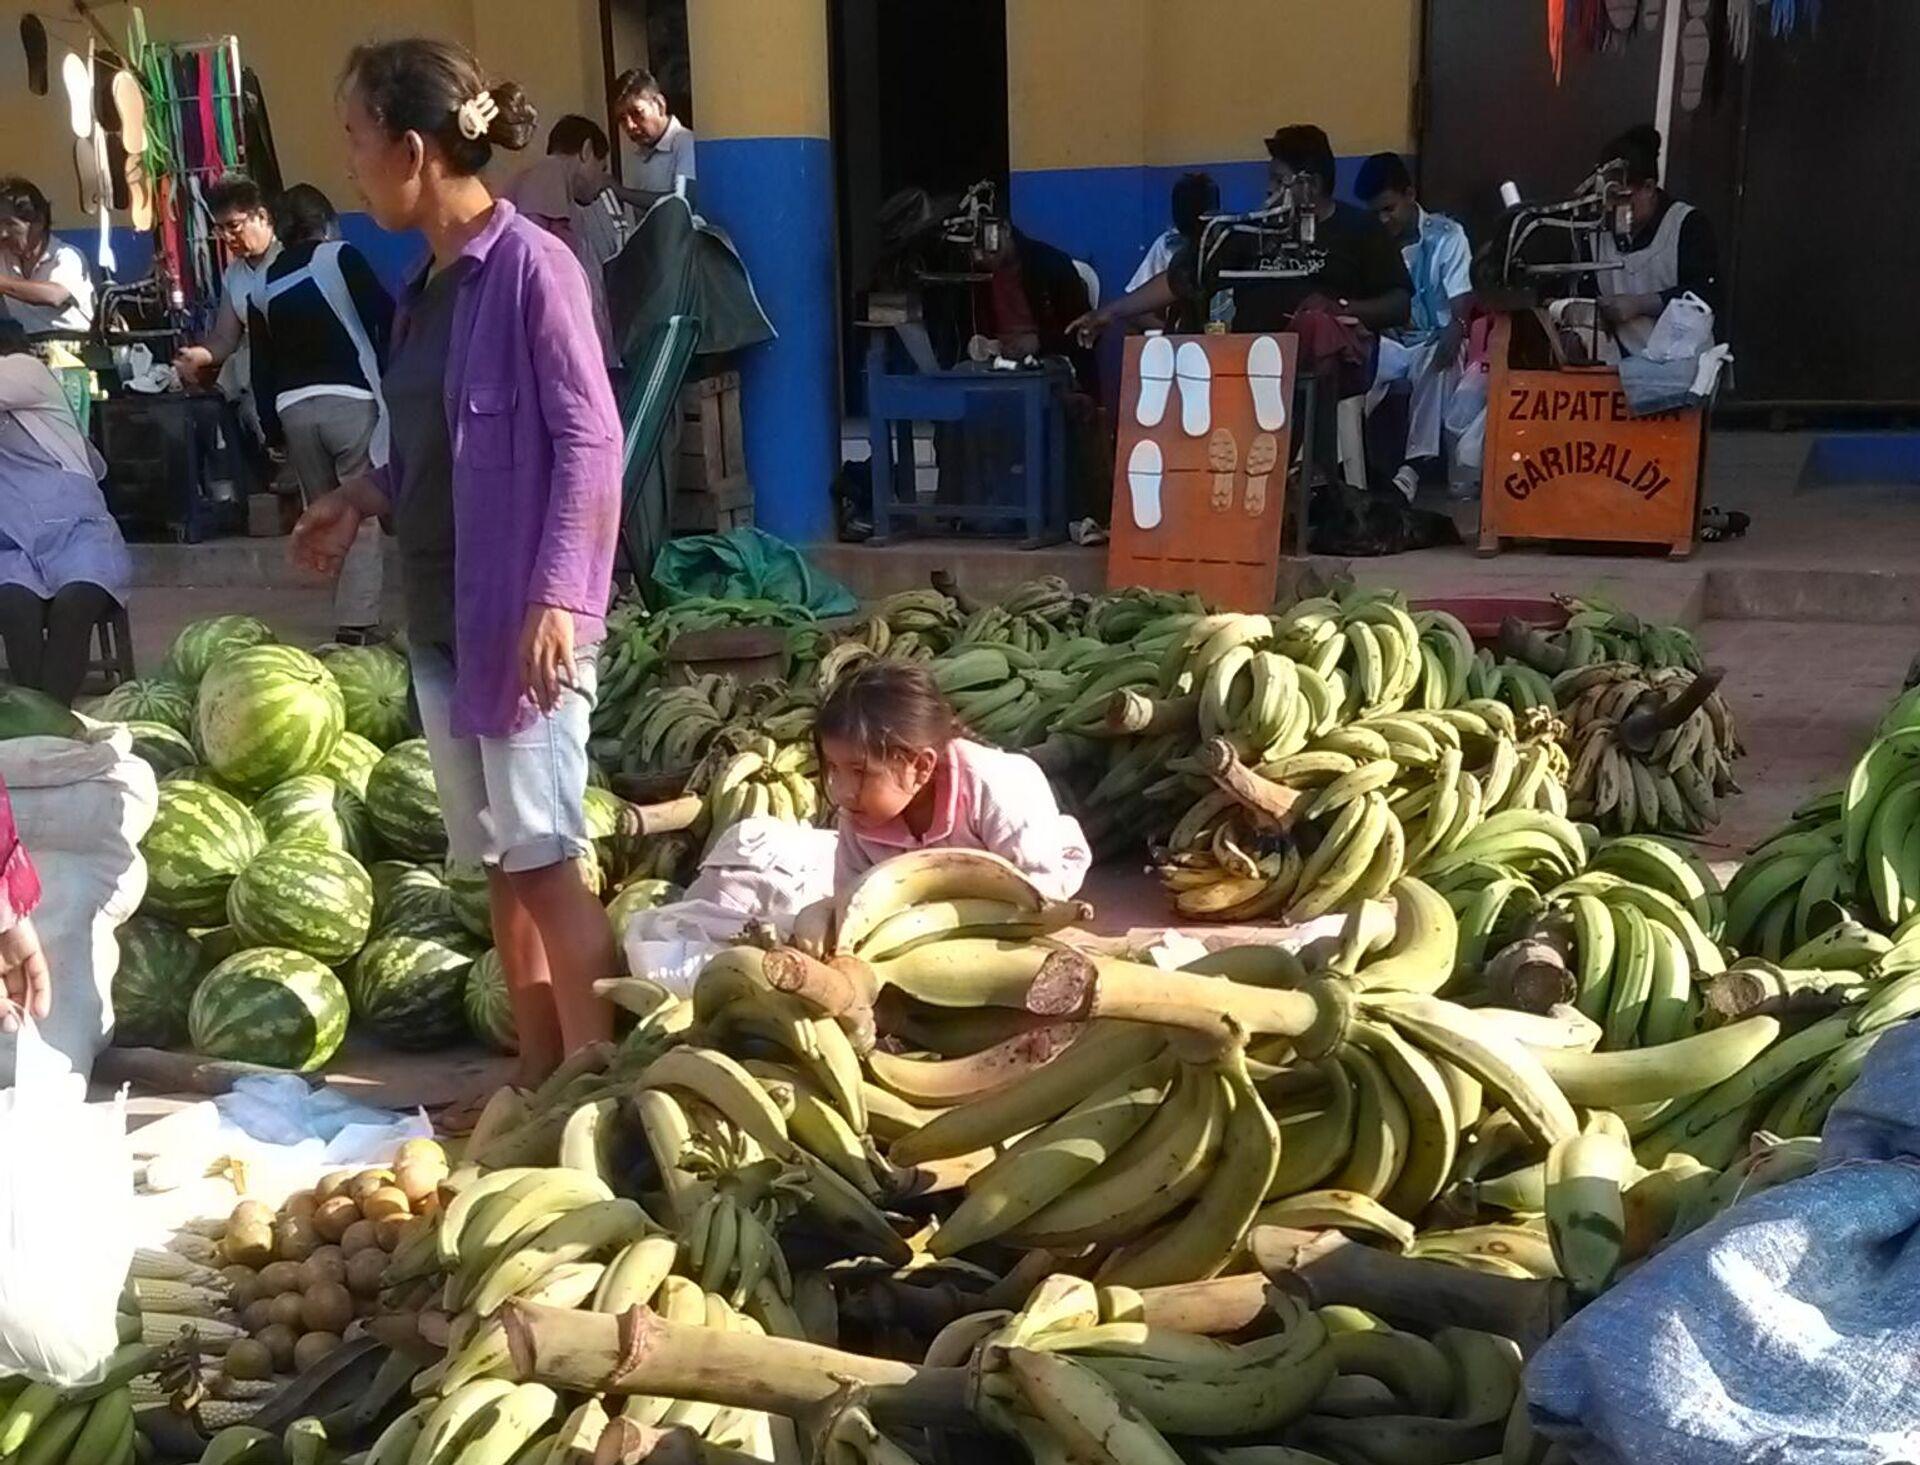 Agricultura familiar campesina en Bolivia - Sputnik Mundo, 1920, 24.09.2021